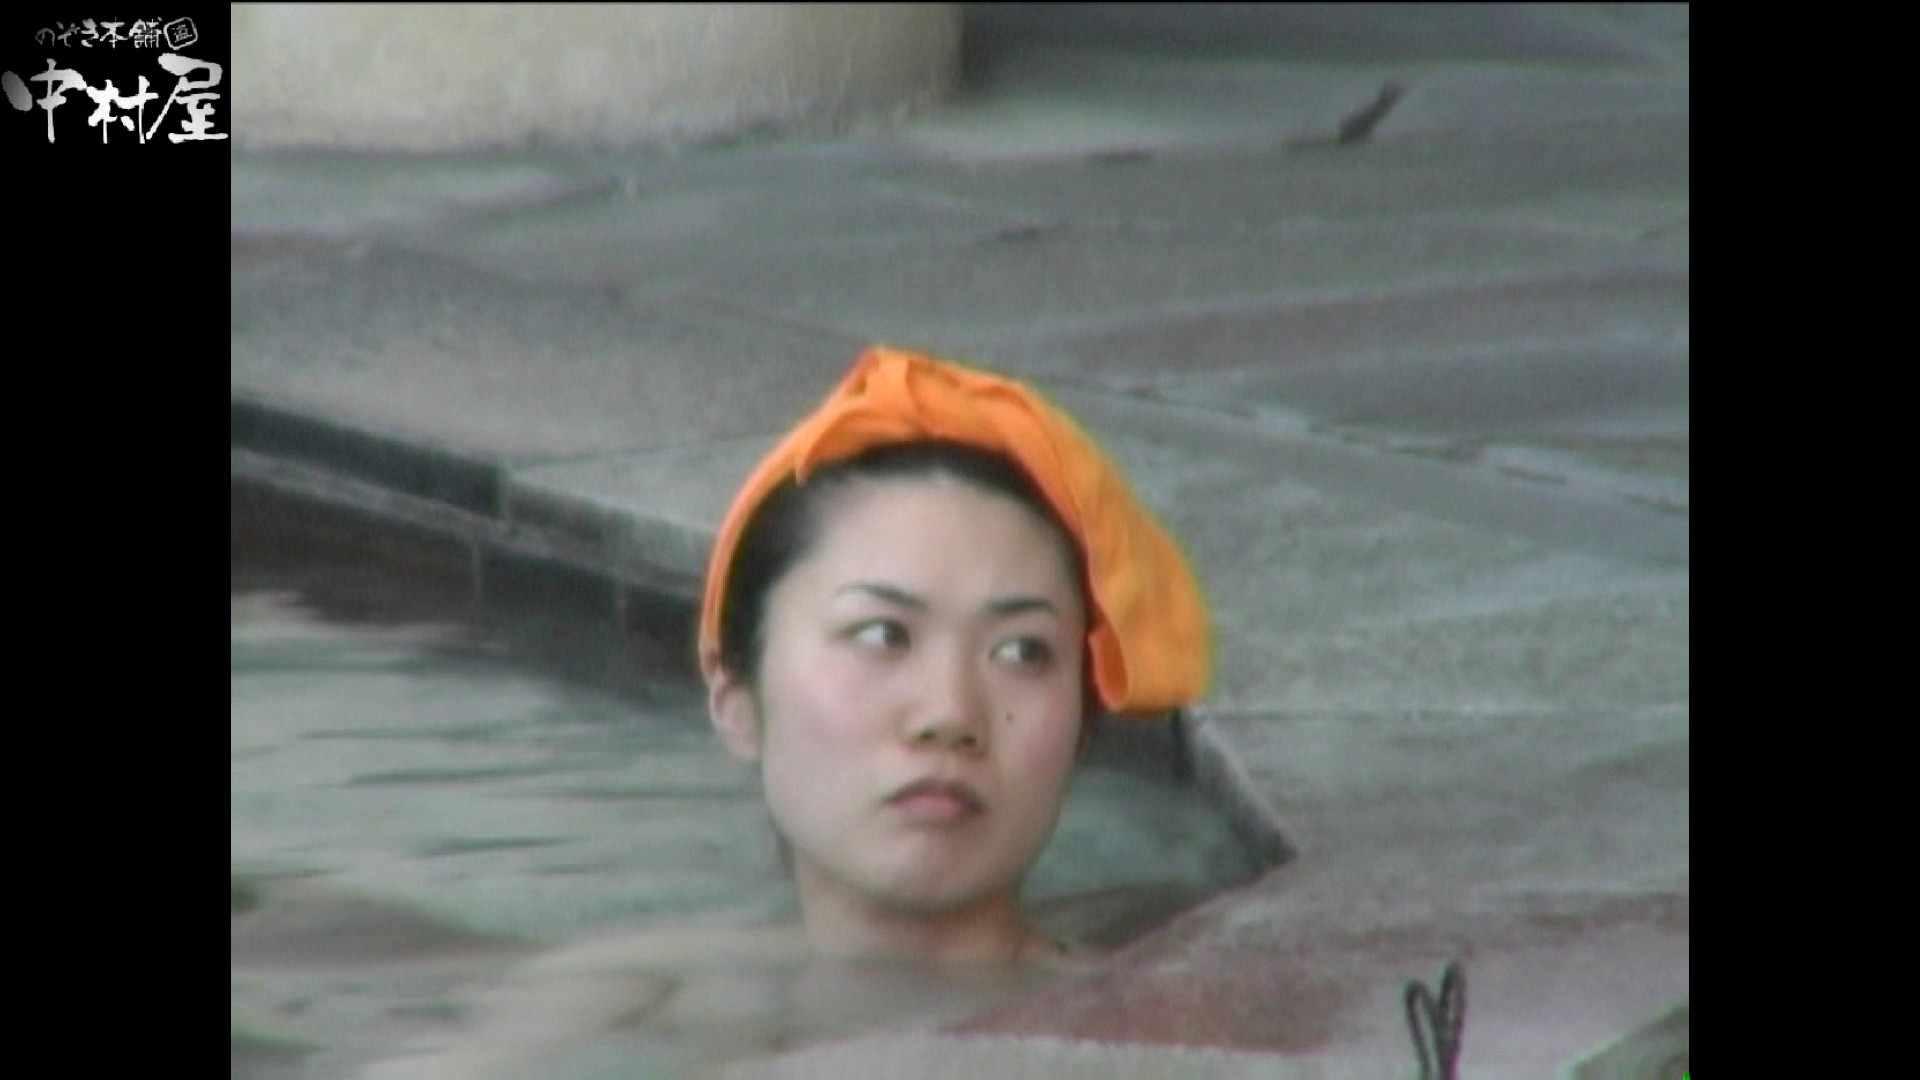 Aquaな露天風呂Vol.978 OLセックス  77画像 63